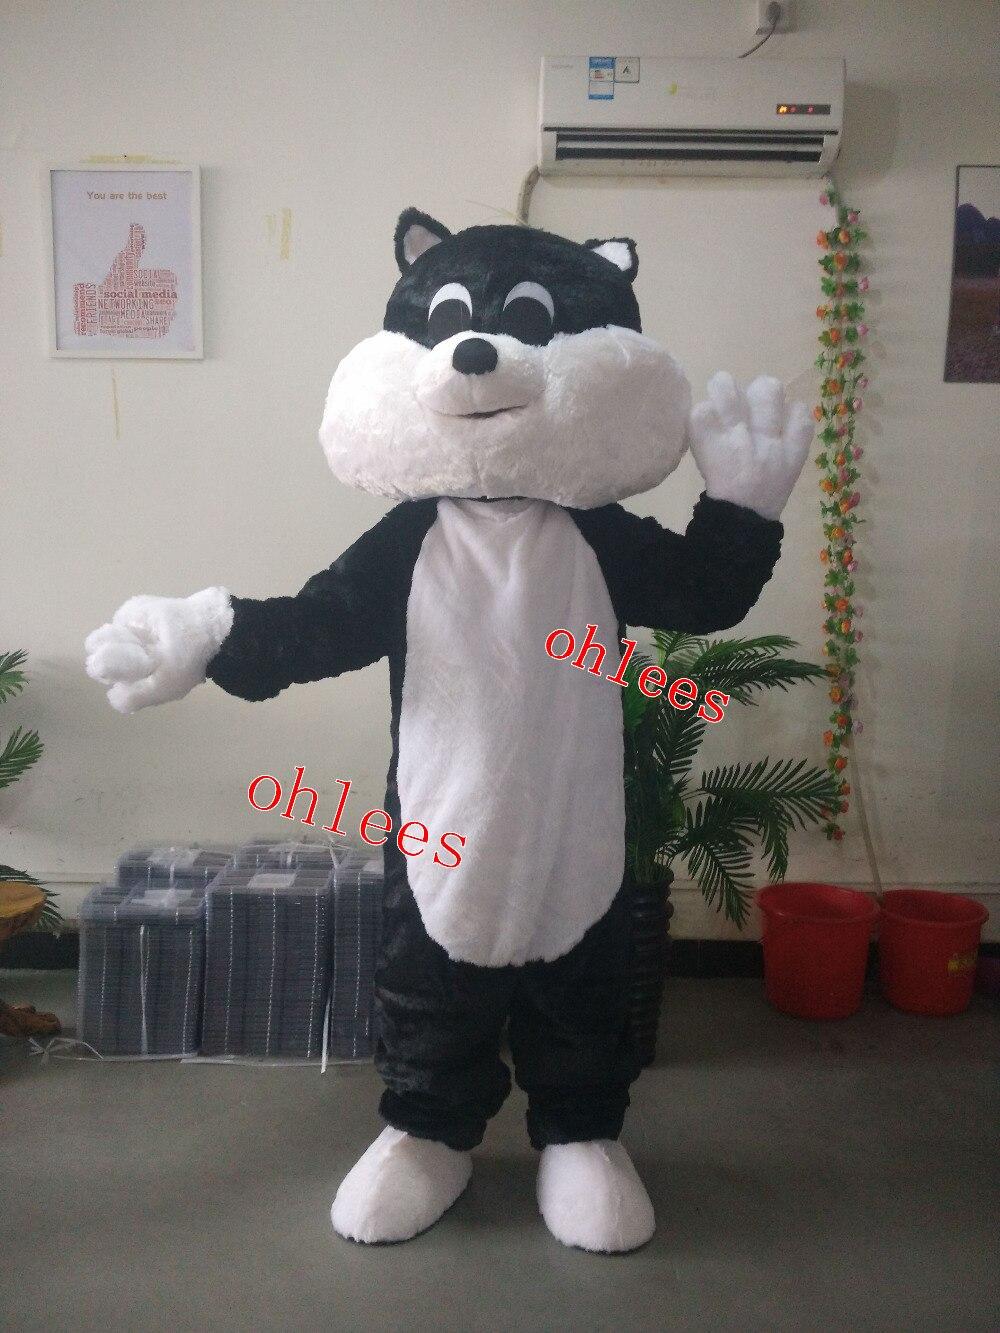 Ohlees joli chat mascotte costumes personnaliser fête anniversaire cosplay cadeau jouet animal tête halloween mascotte costume